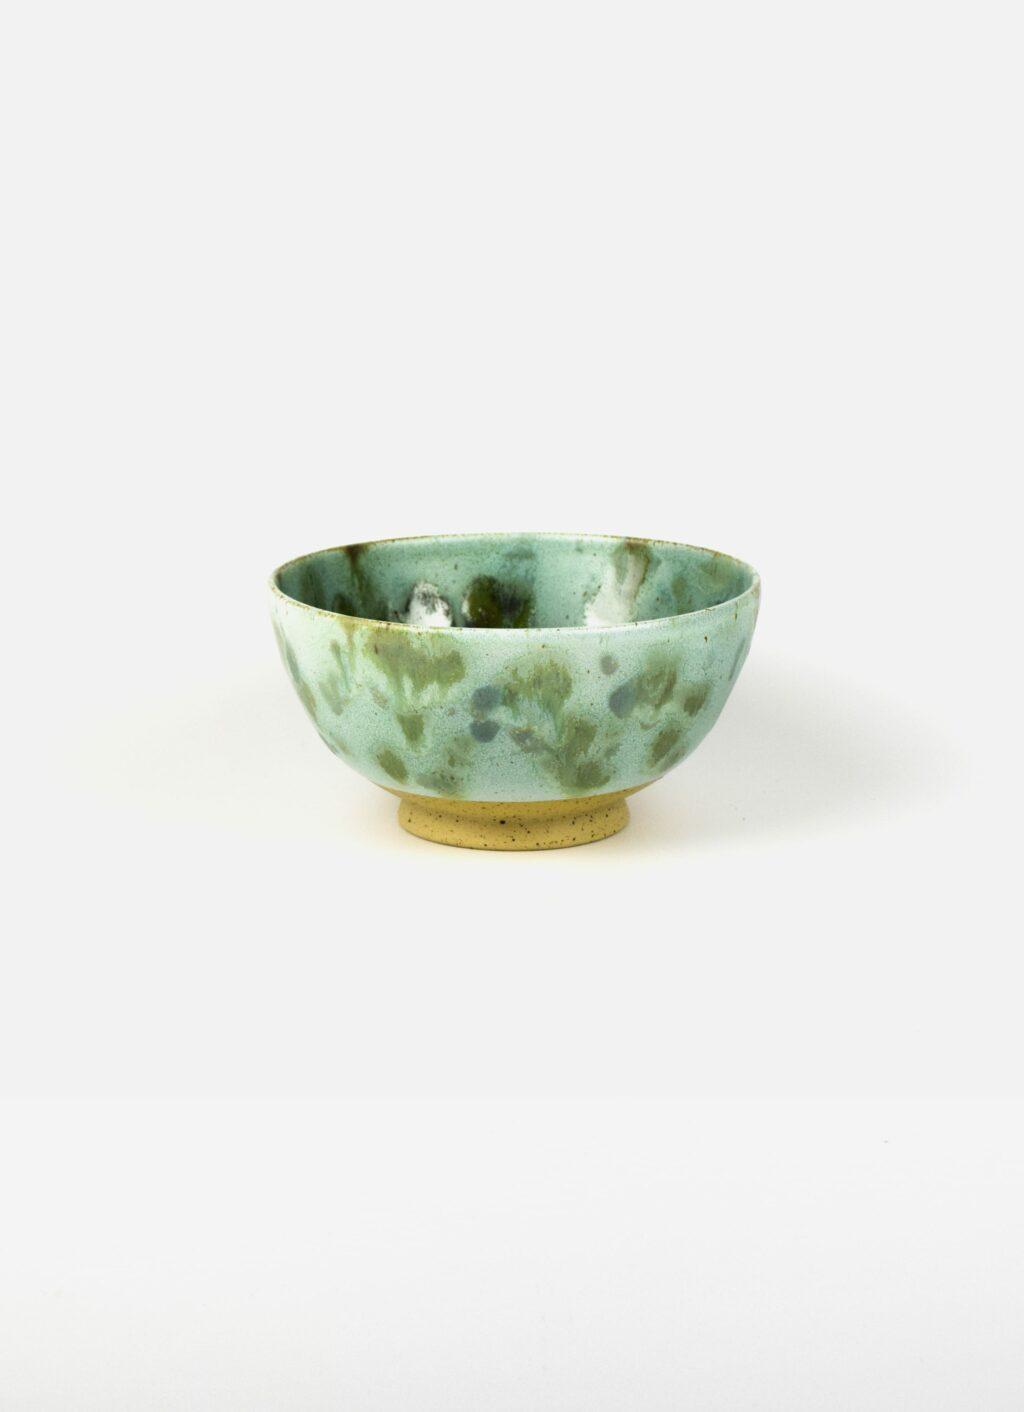 Studio Arhoj - Spring Bowl - Spotted Hornfels